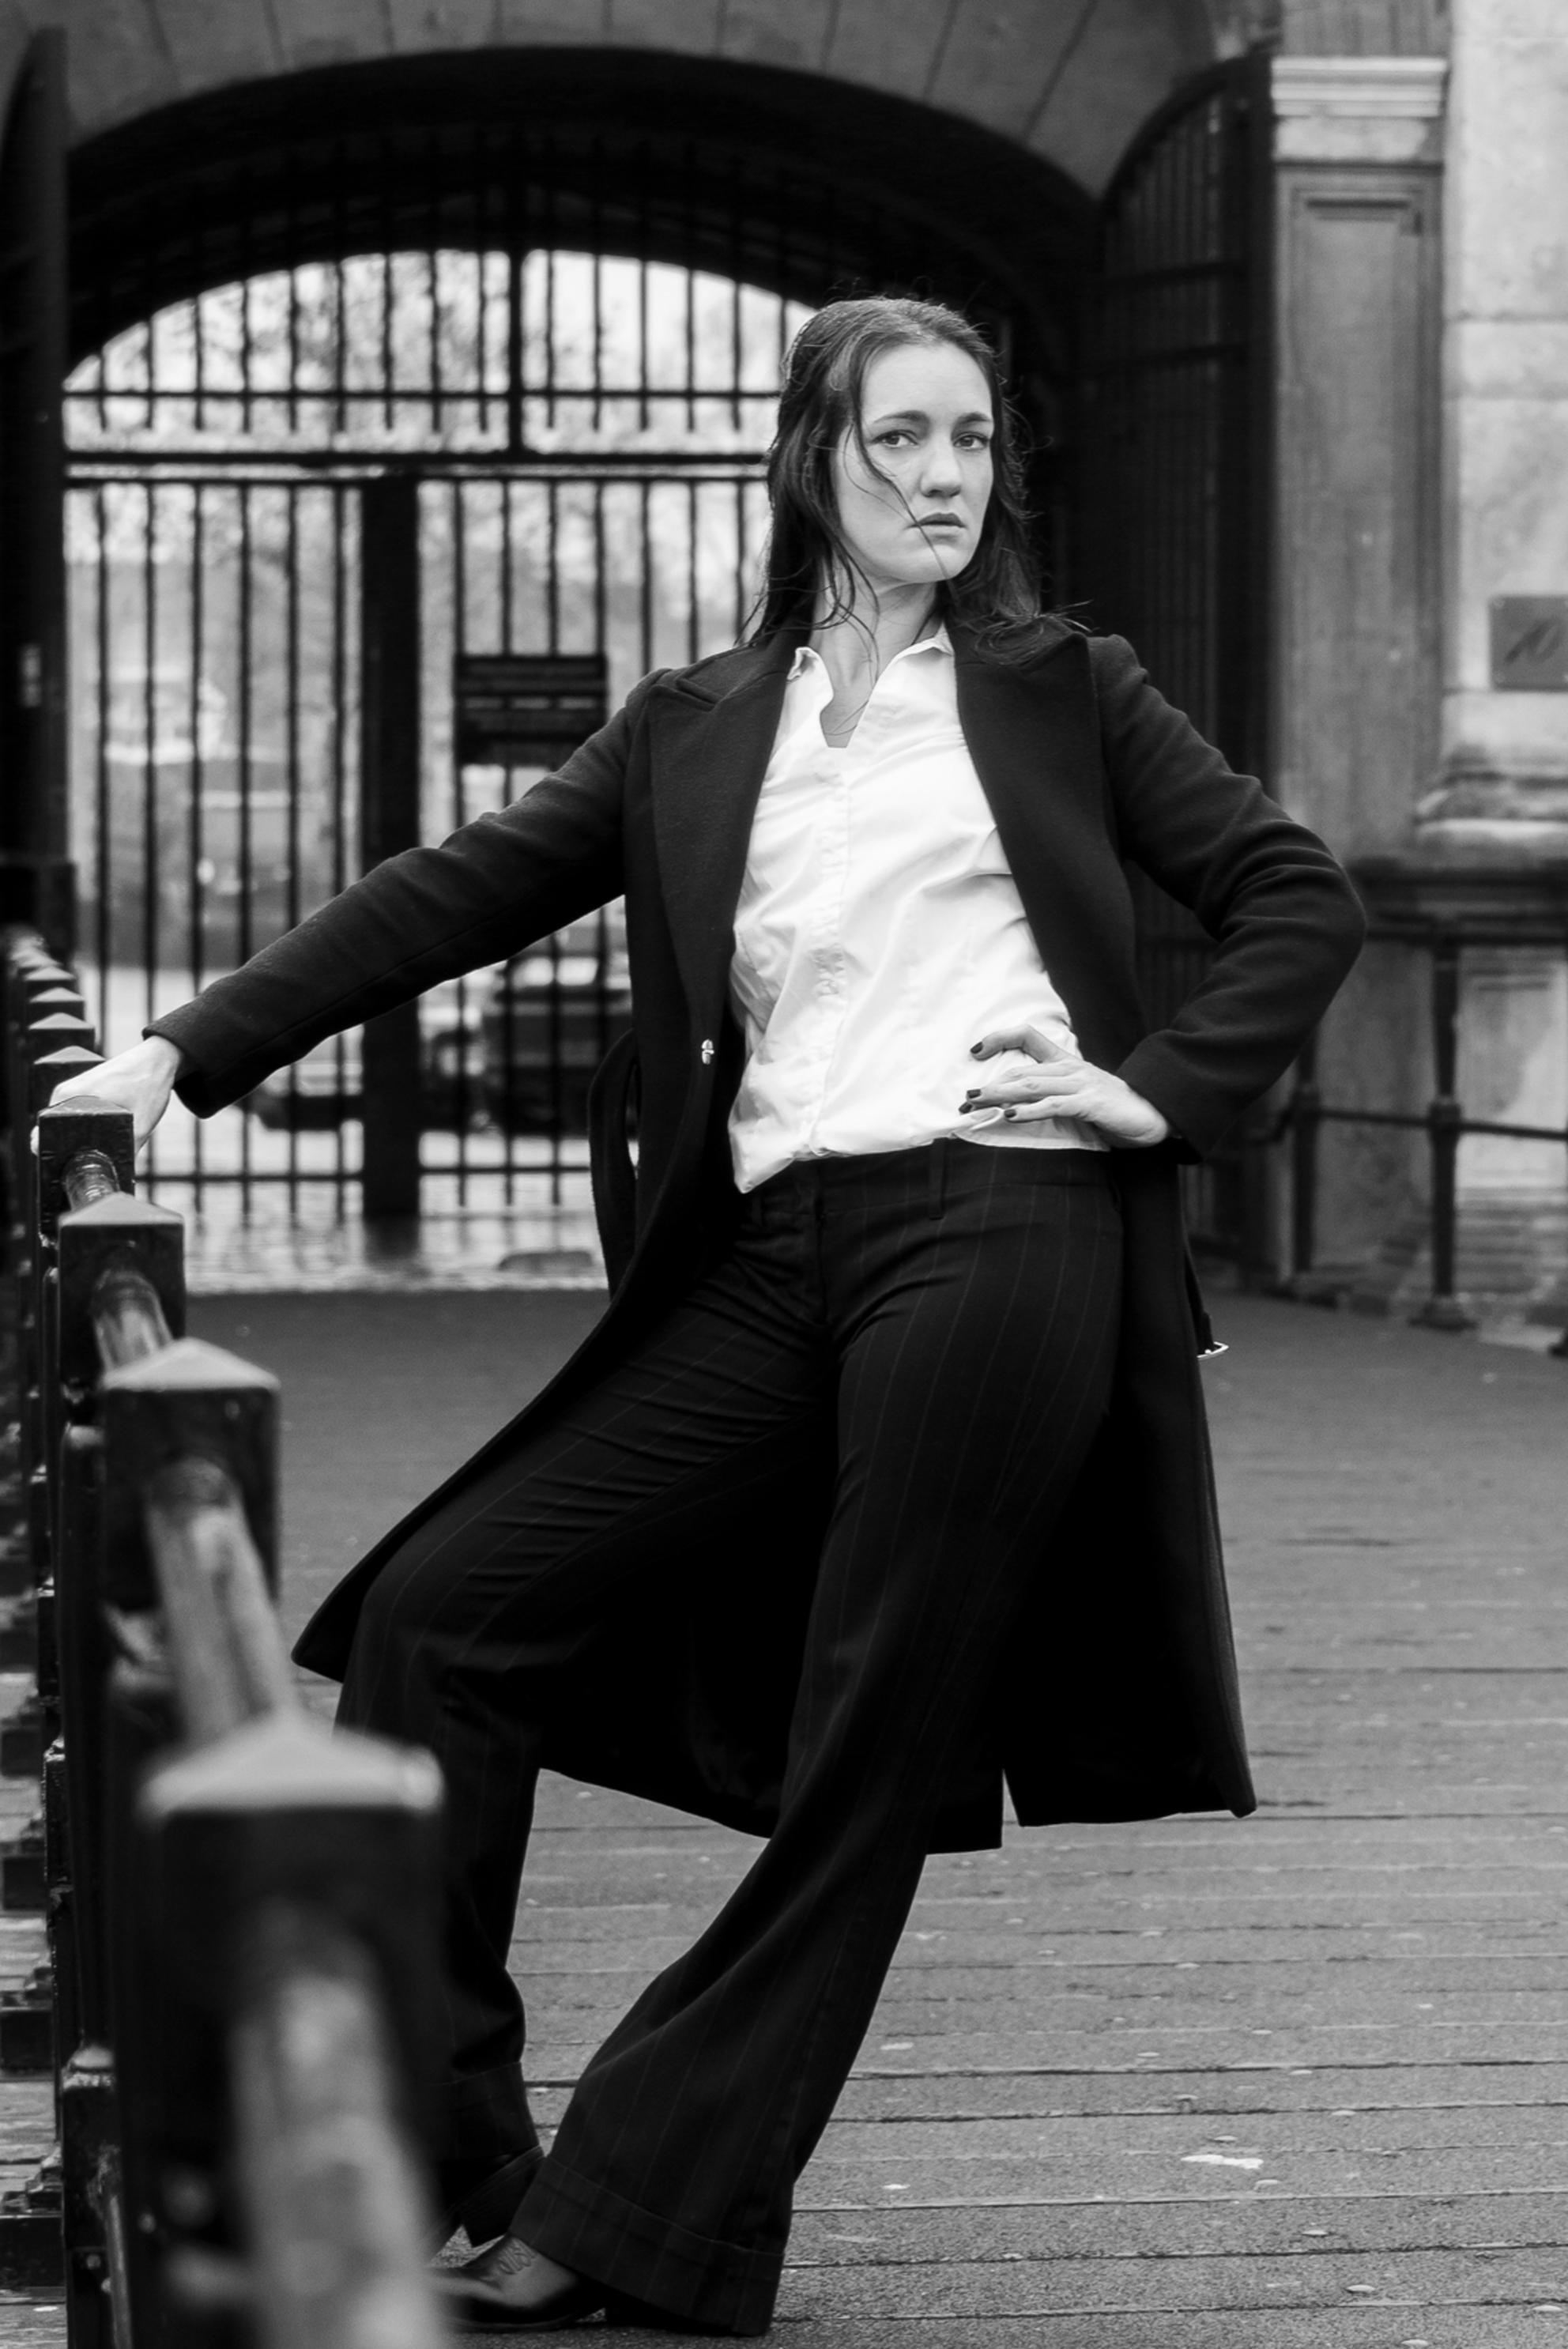 90's shoot 2 - - - foto door DaphneGodschalk op 31-01-2020 - deze foto bevat: vrouw, portret, reclame, model, fashion, beauty, zwartwit, sfeer, pose, mode, magazine, fotoshoot, kleding, locatie, commercial, editorial, fashionfotografie